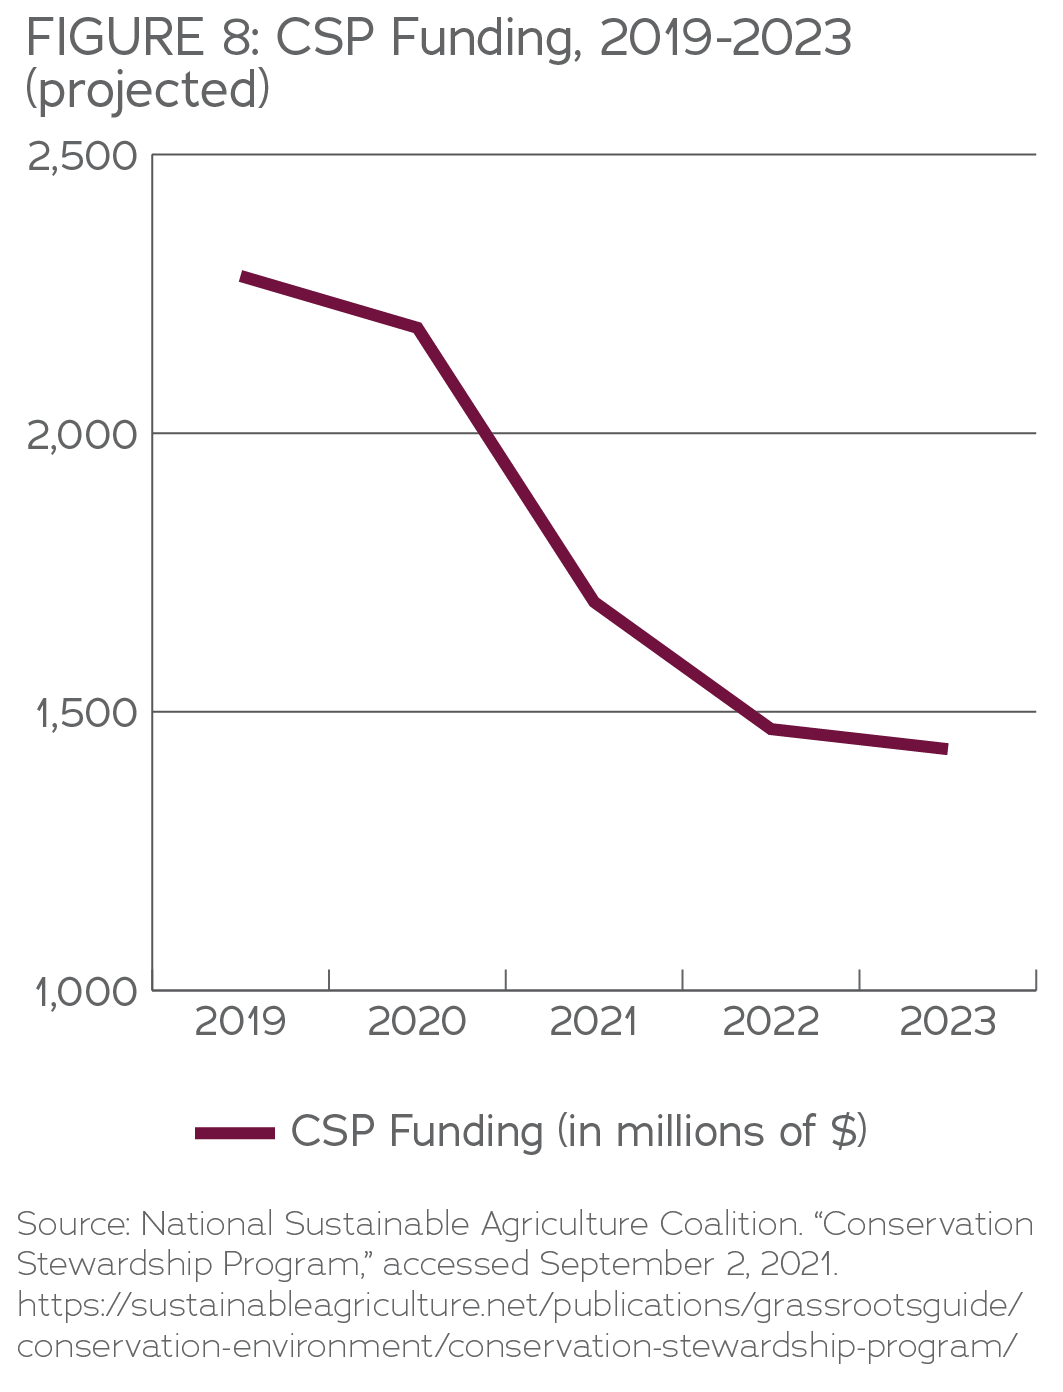 CSP Funding 2019-2023